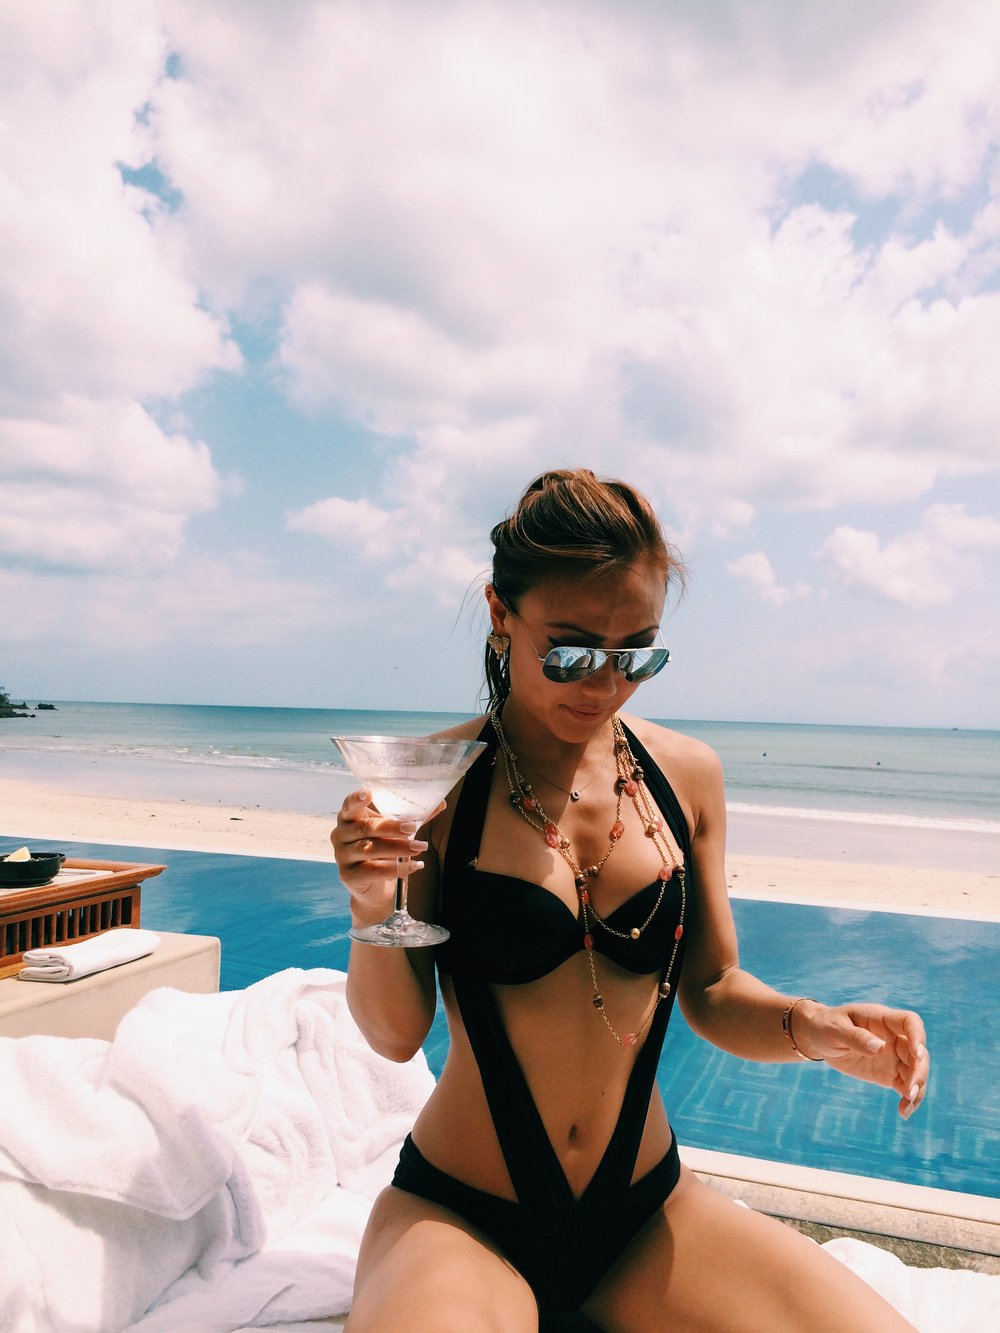 Martini in hand, sunshine, and beach = happy camper